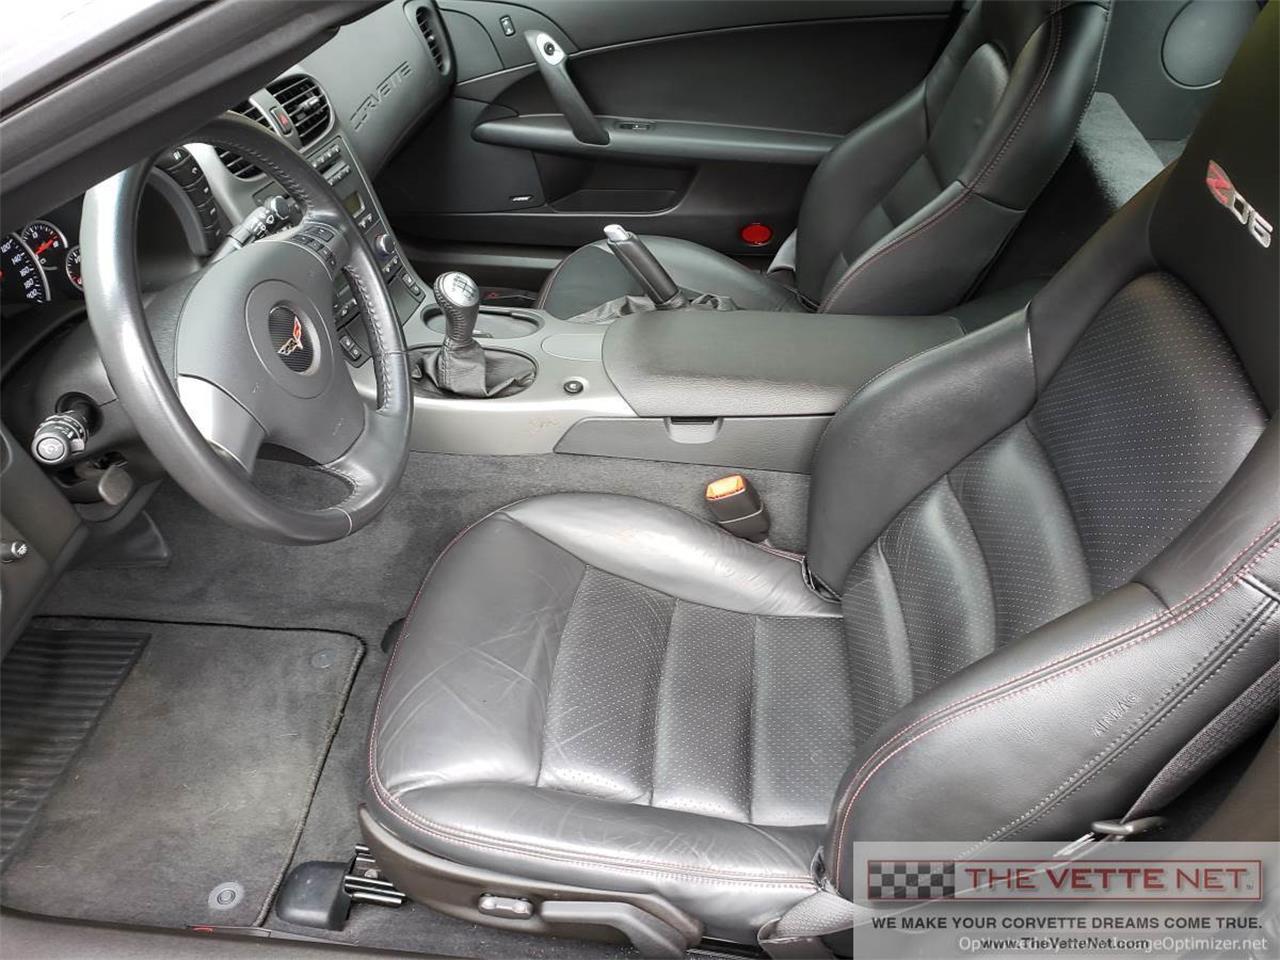 2007 Chevrolet Corvette (CC-1419963) for sale in Sarasota, Florida